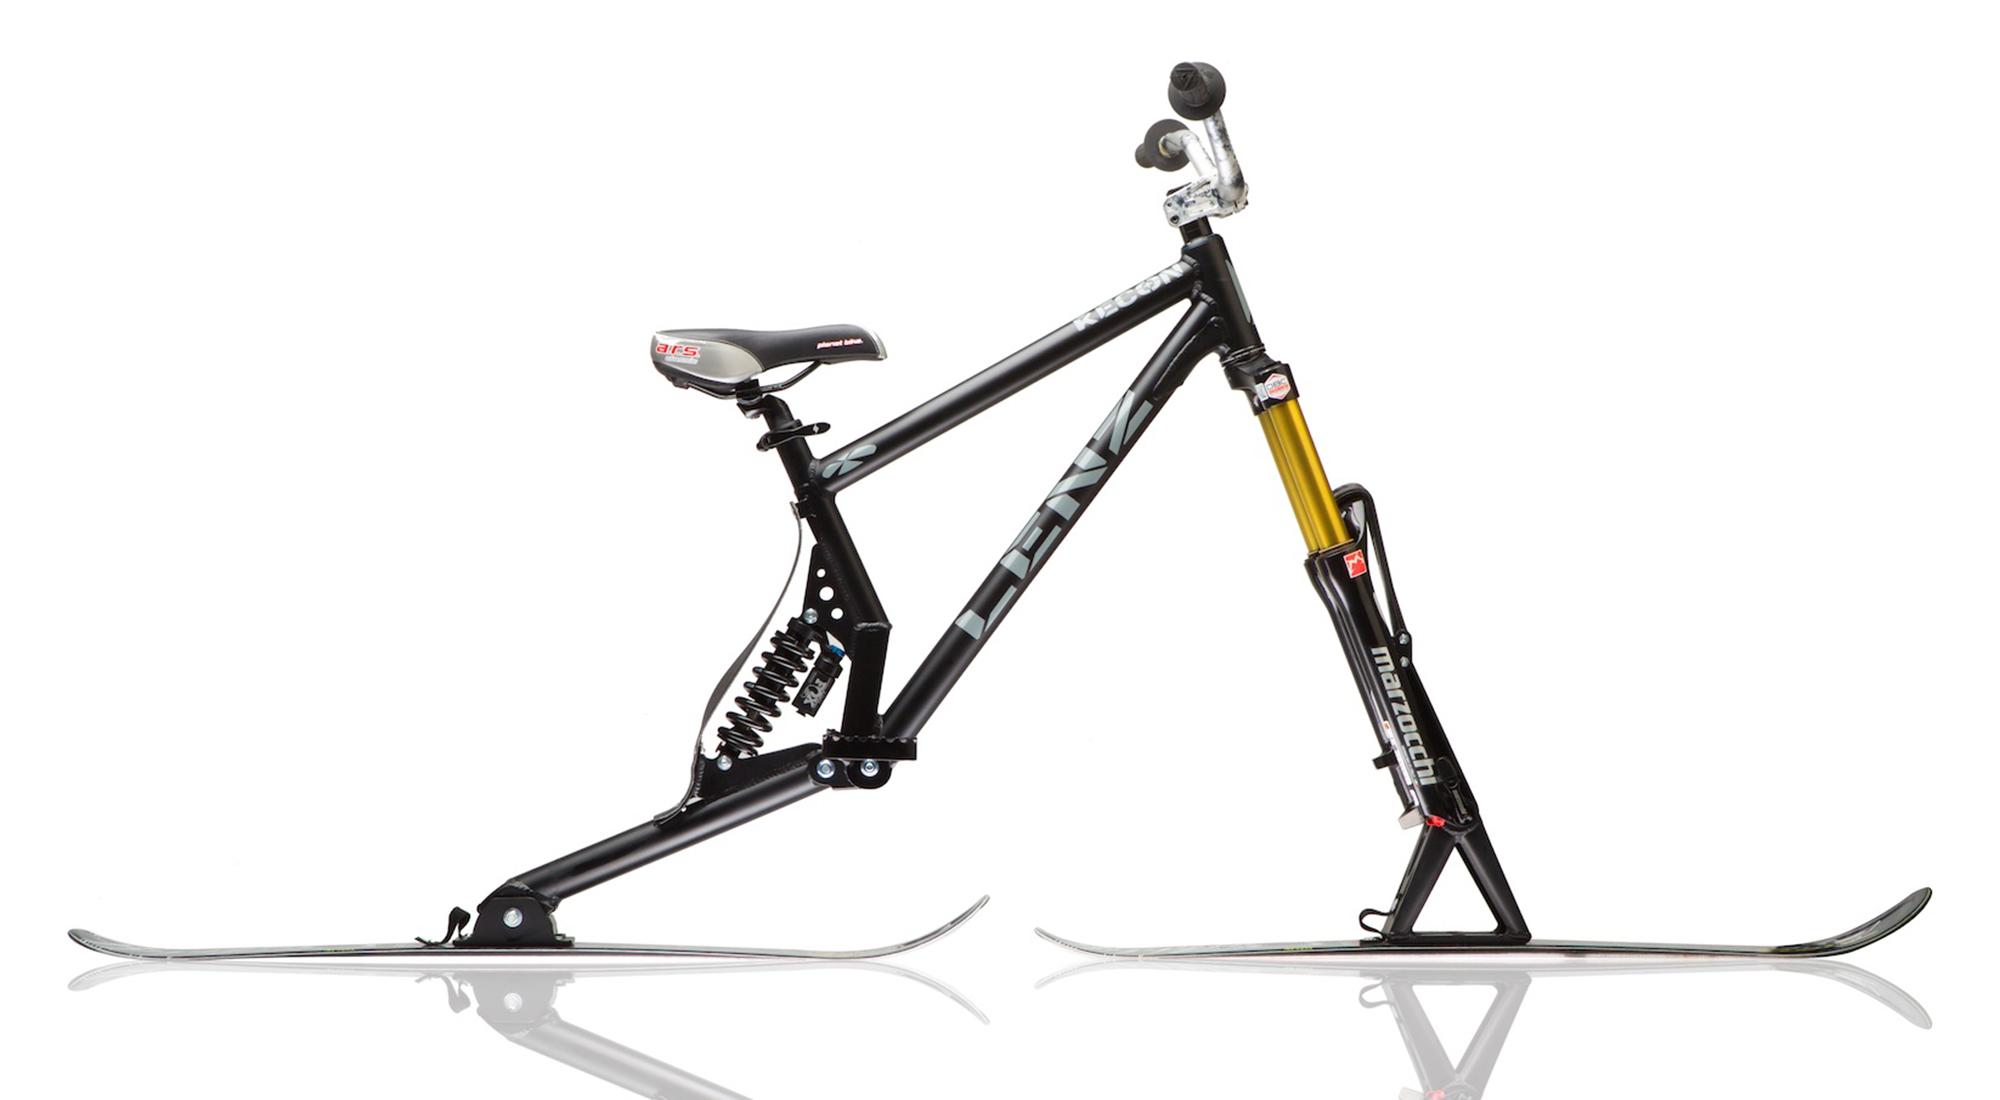 Lenz ski bike - Recon Full Suspension Ski Bike